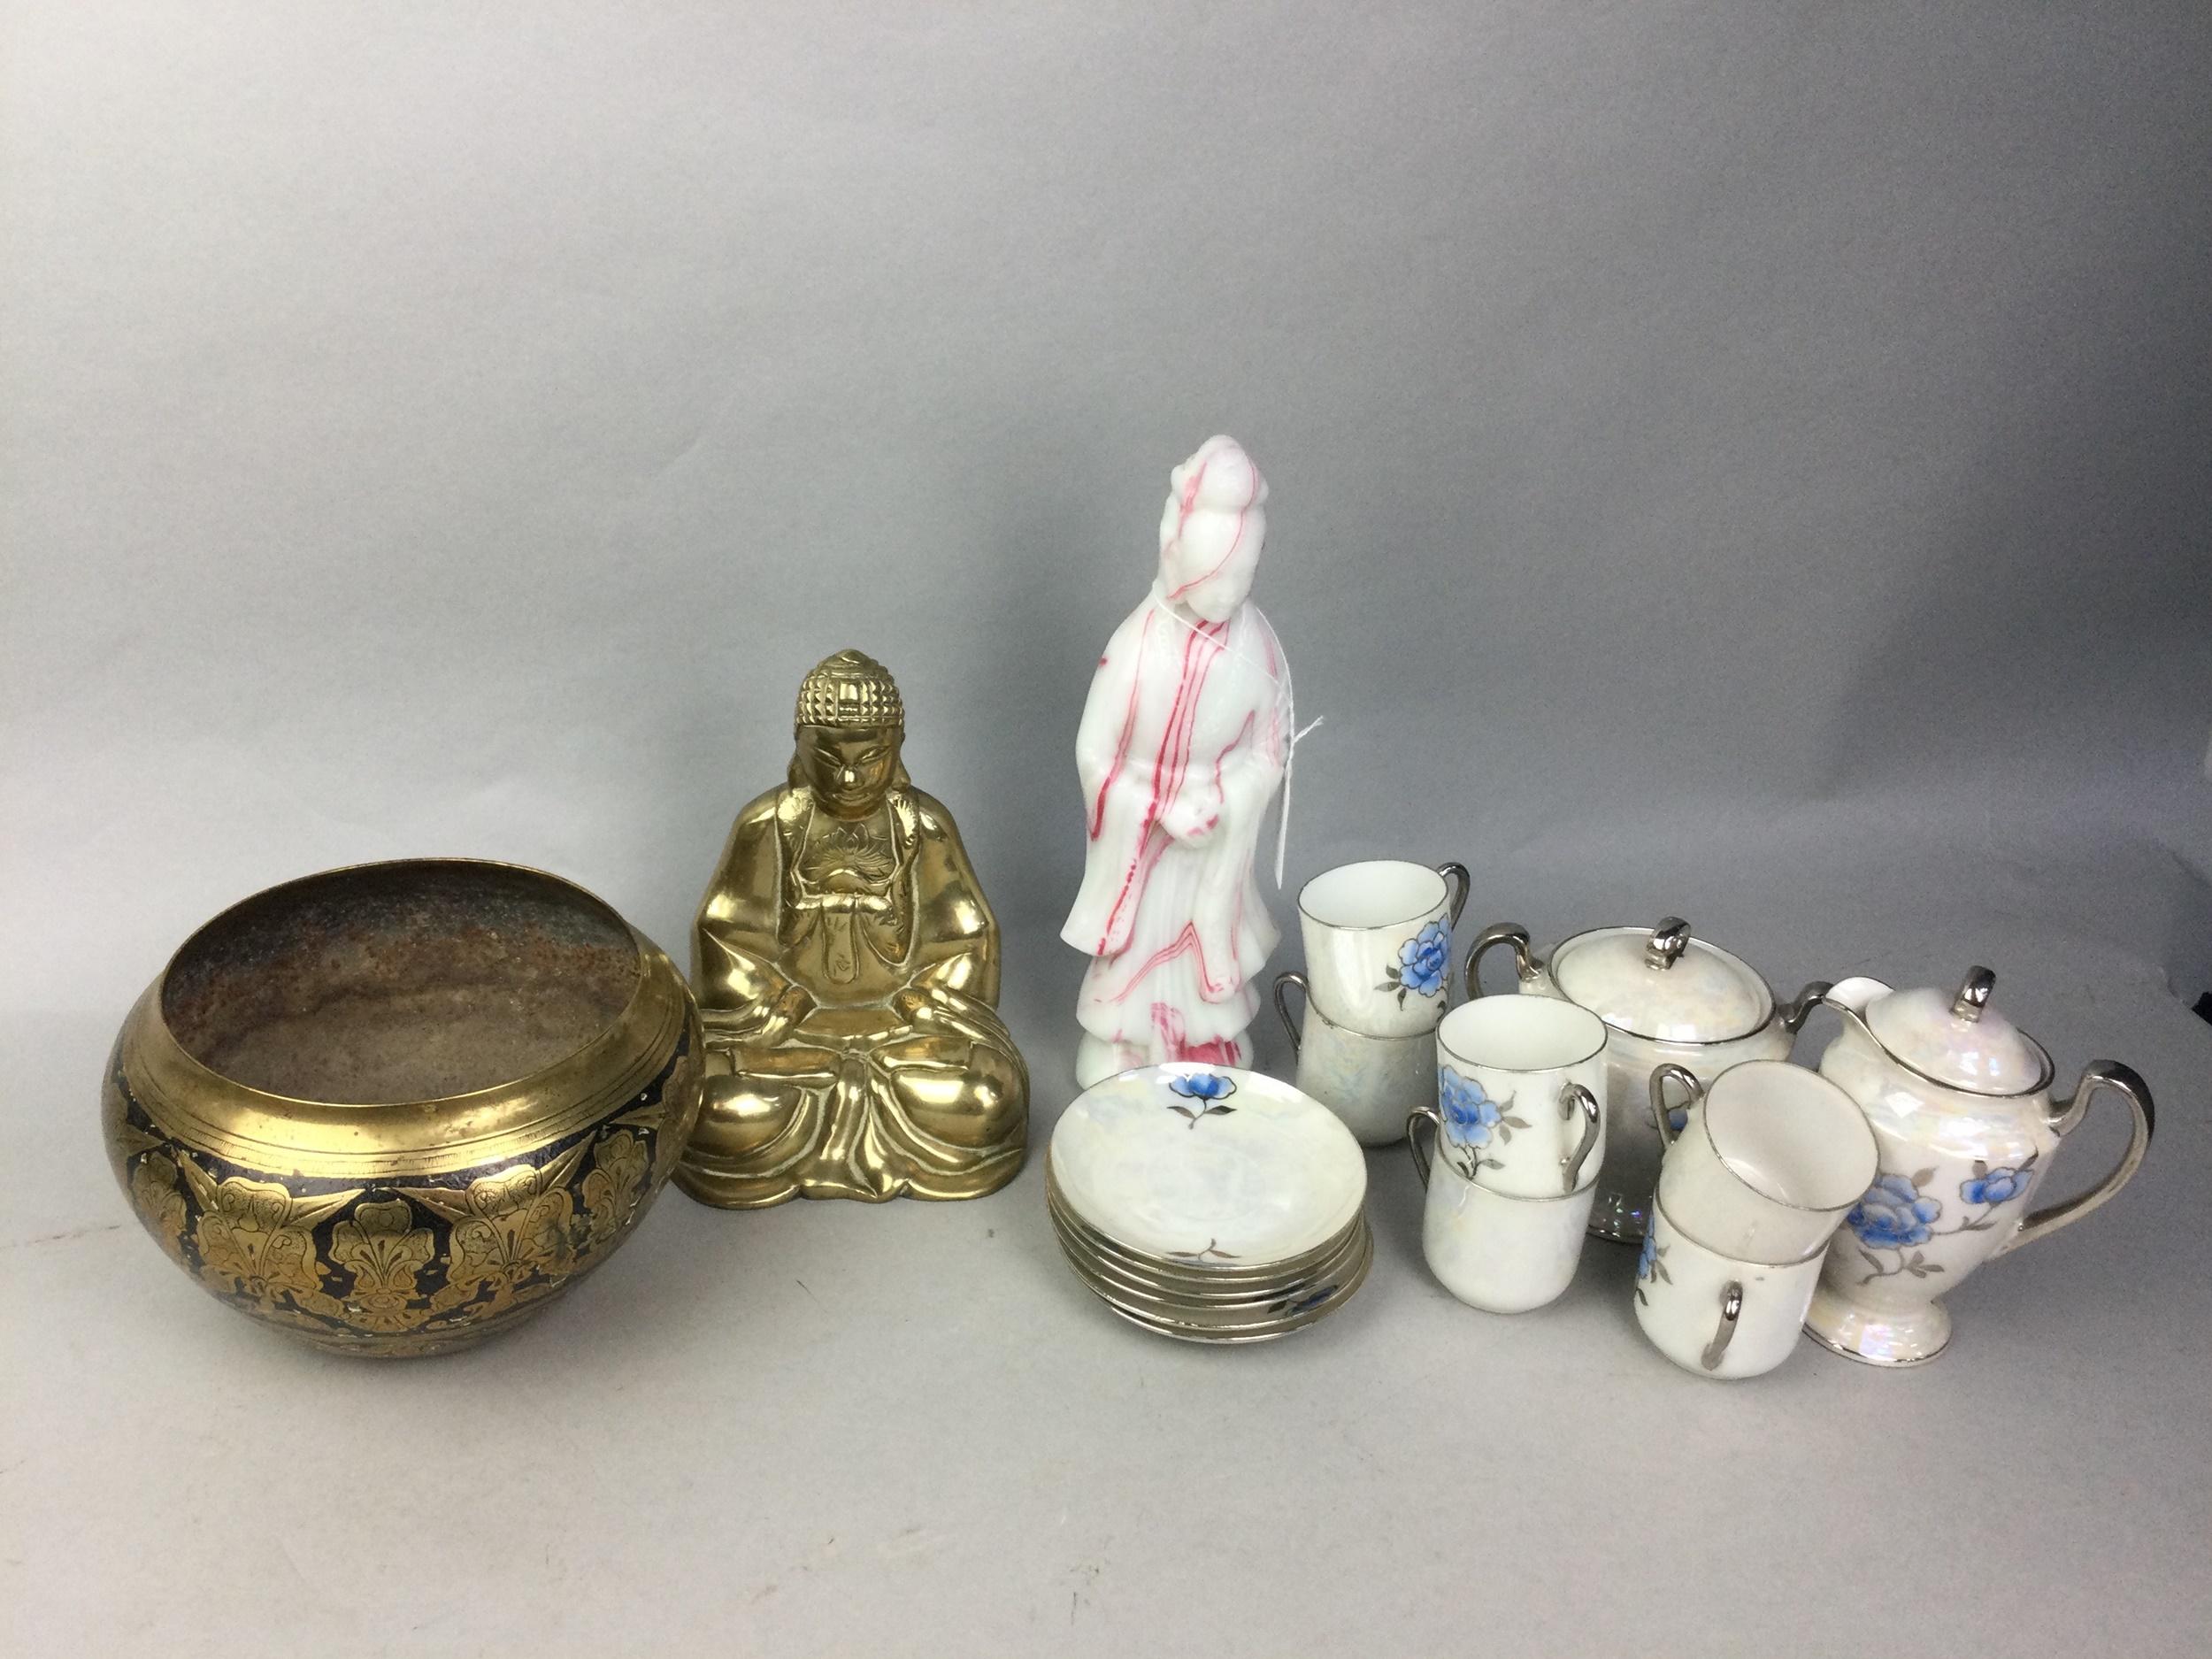 A JAPANESE EGG SHELL TEA SERVICE, A BRASS BUDDHA, A BRASS BOWL, A GLASS DEITY AND A GLASS BOWL